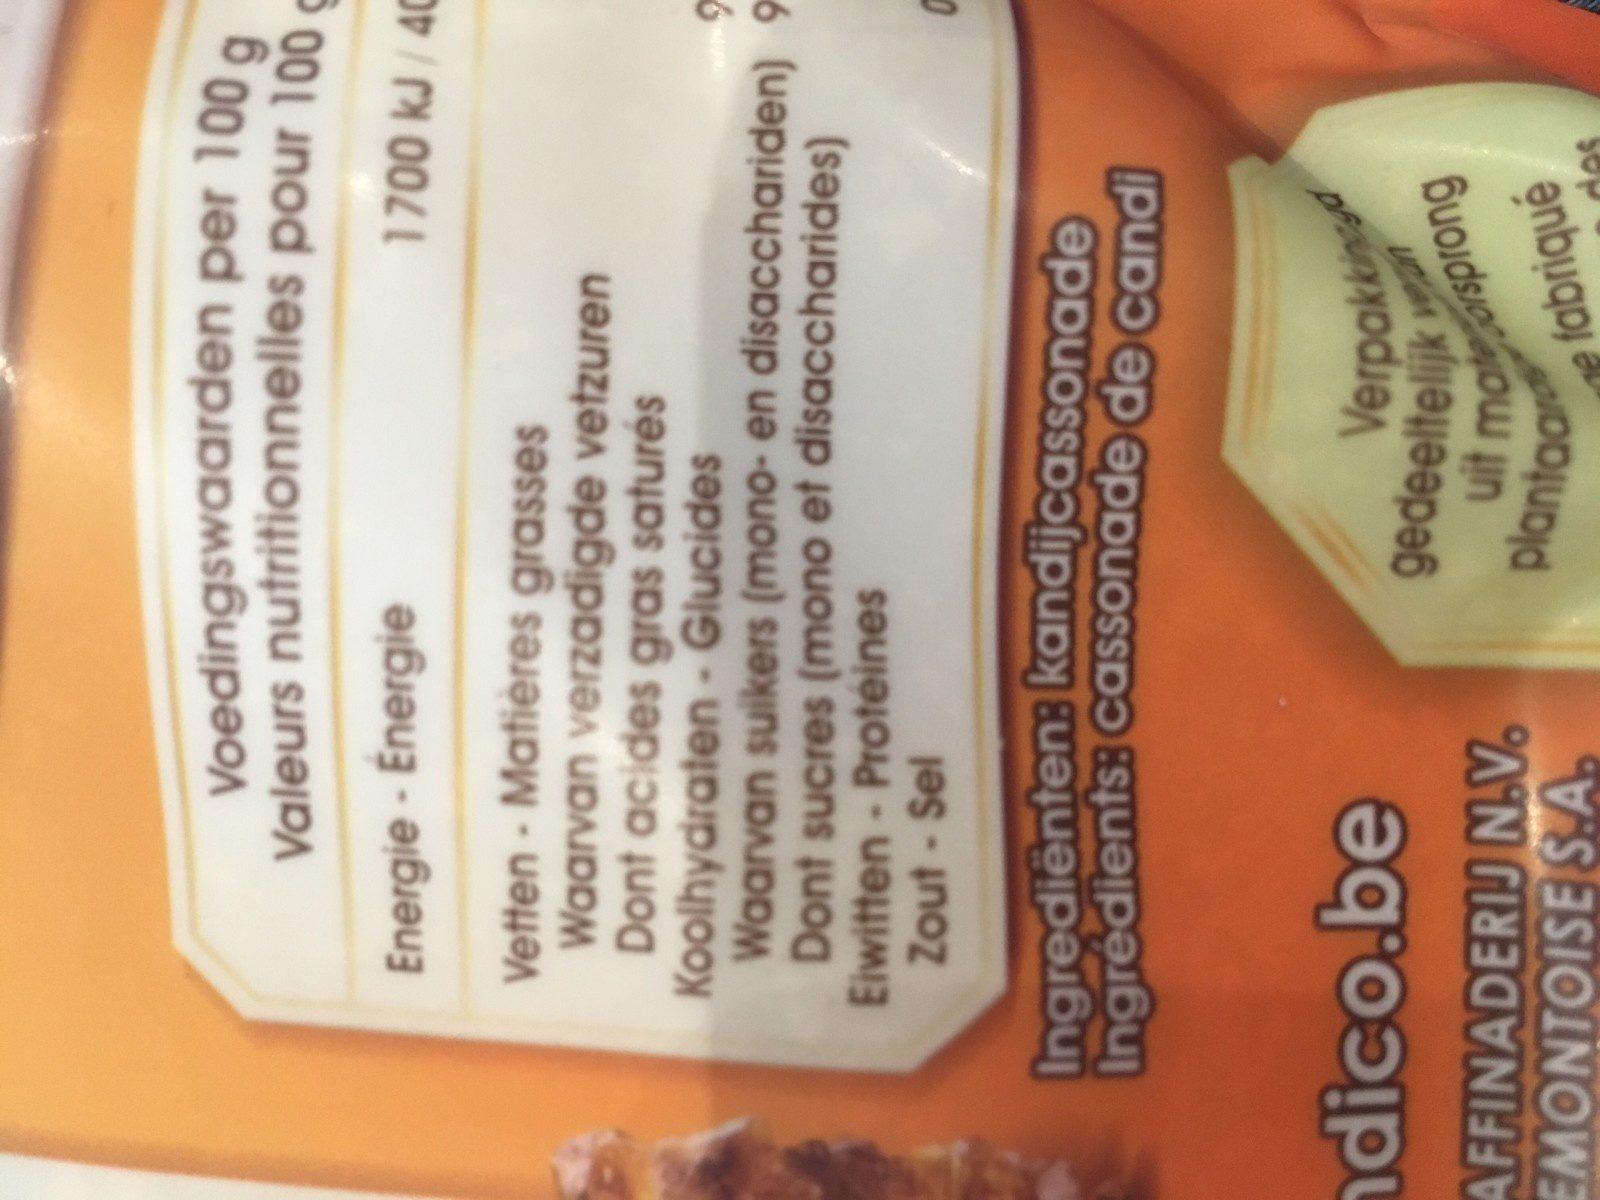 Cassonade de candi blonde - Ingrediënten - fr